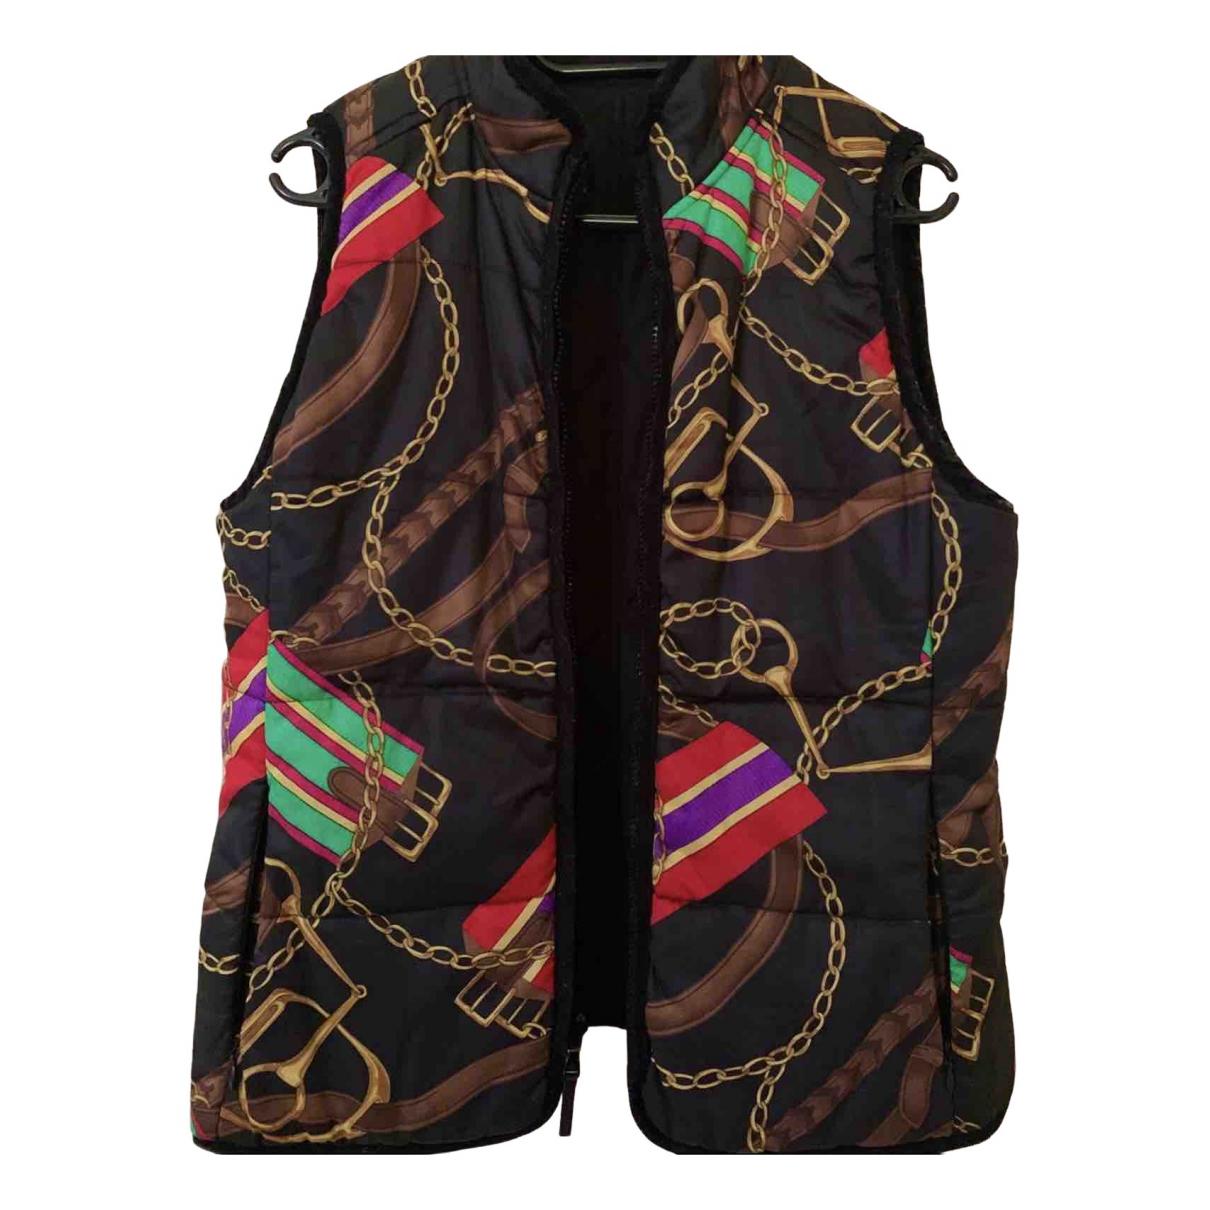 Lauren Ralph Lauren \N Multicolour jacket for Women XS International